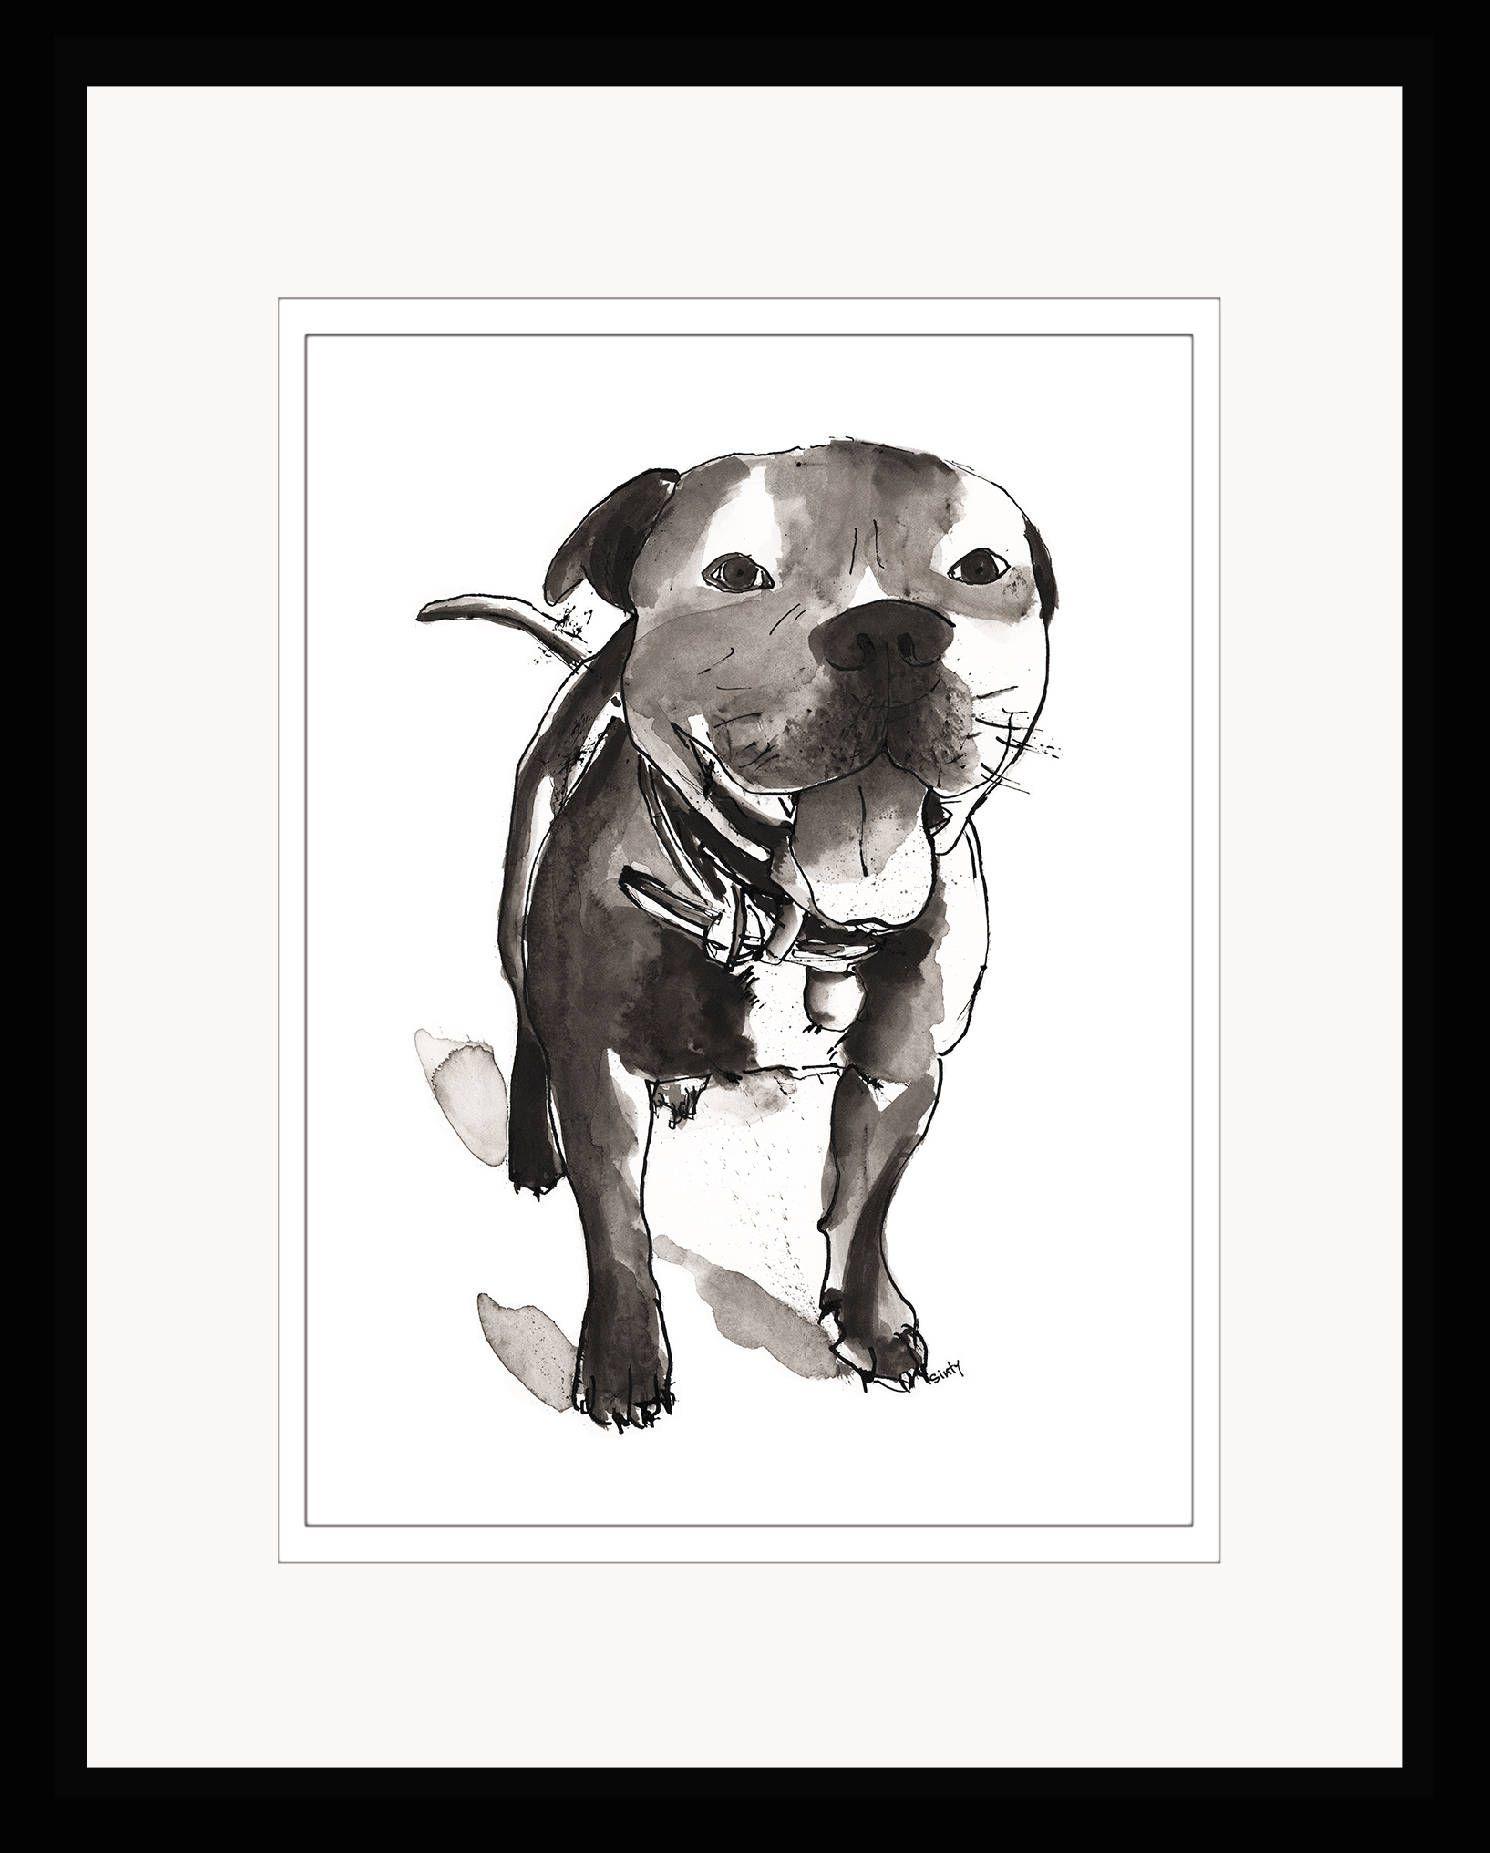 Staffordshire Bull Terrier Digital Print Download Staffy Dog Printable Art By Sintyartshop On Etsy Staffy Dog Digital Prints Funky Art